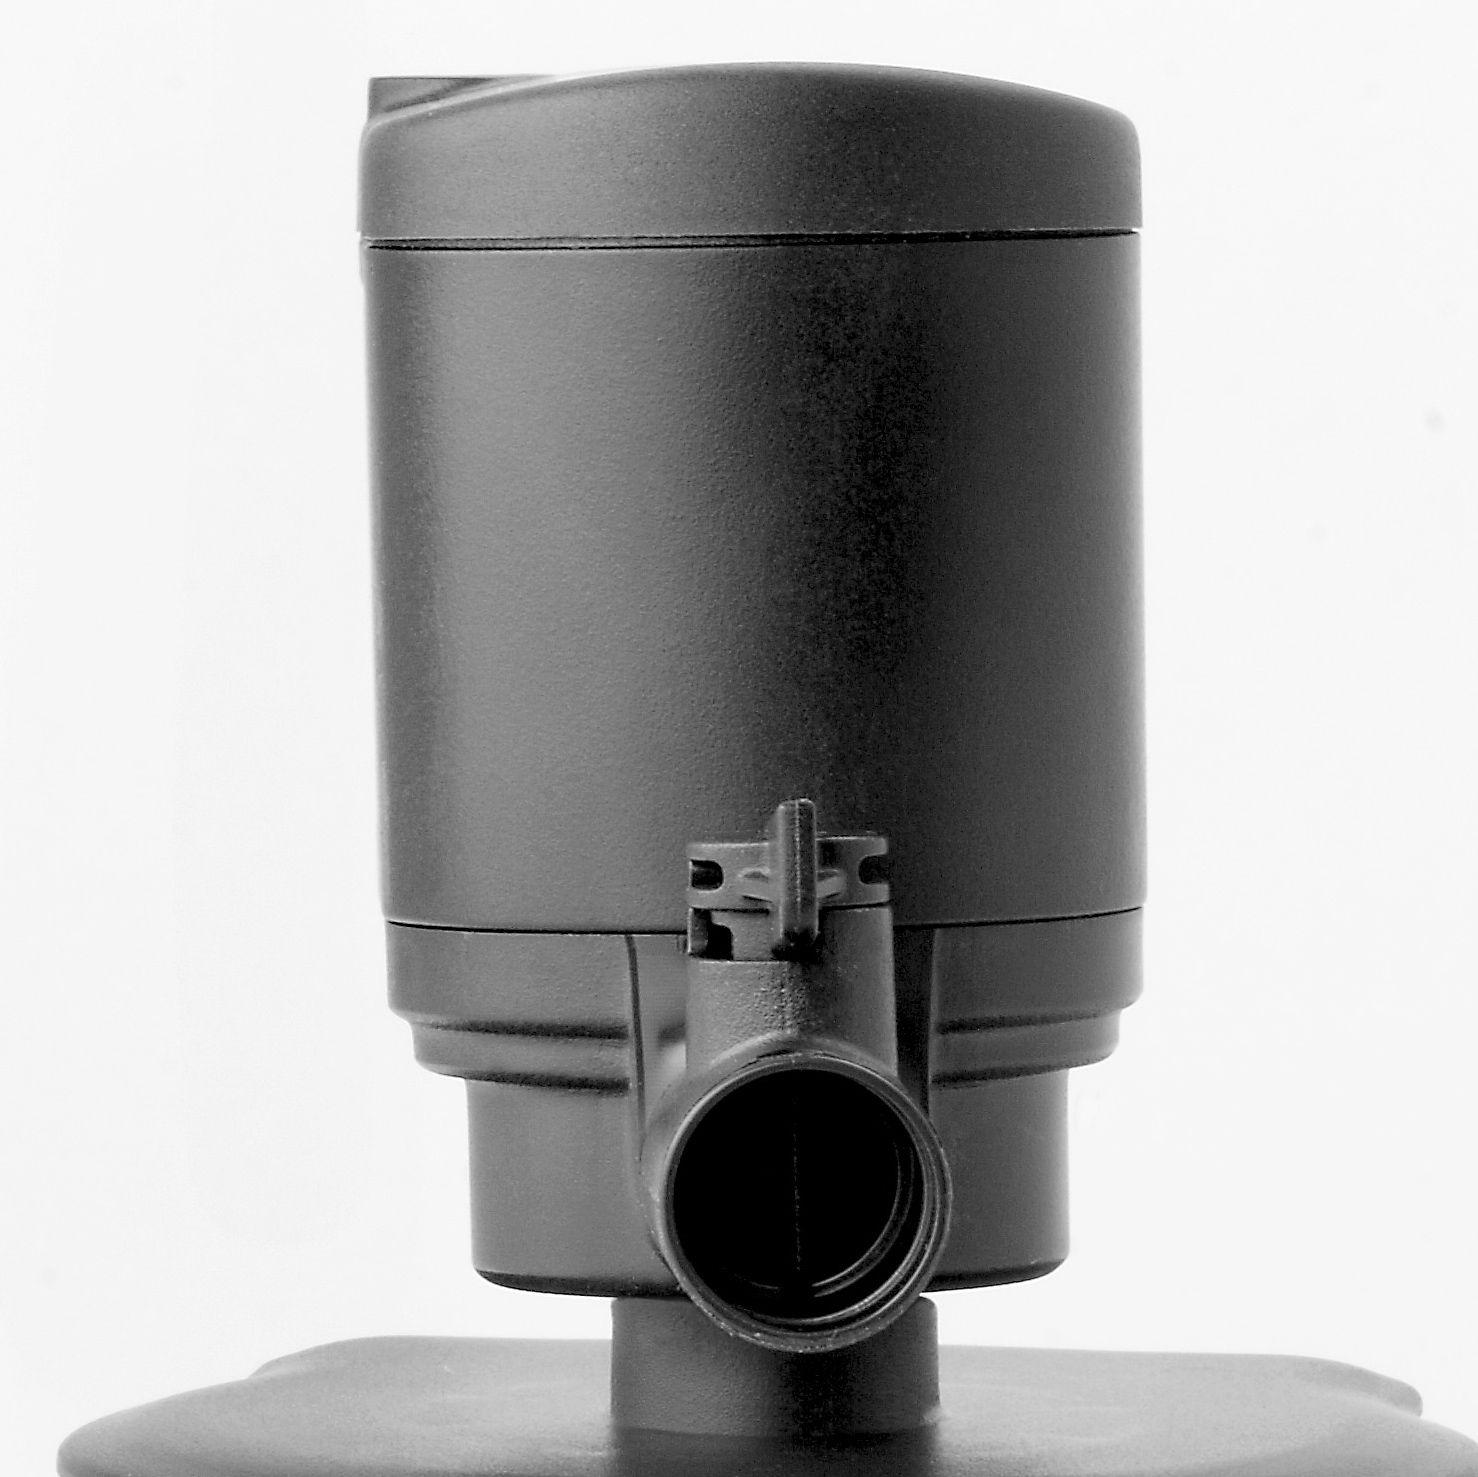 Aquael Turbo filter 2000 модель Turbo 2000 внутренний фильтр